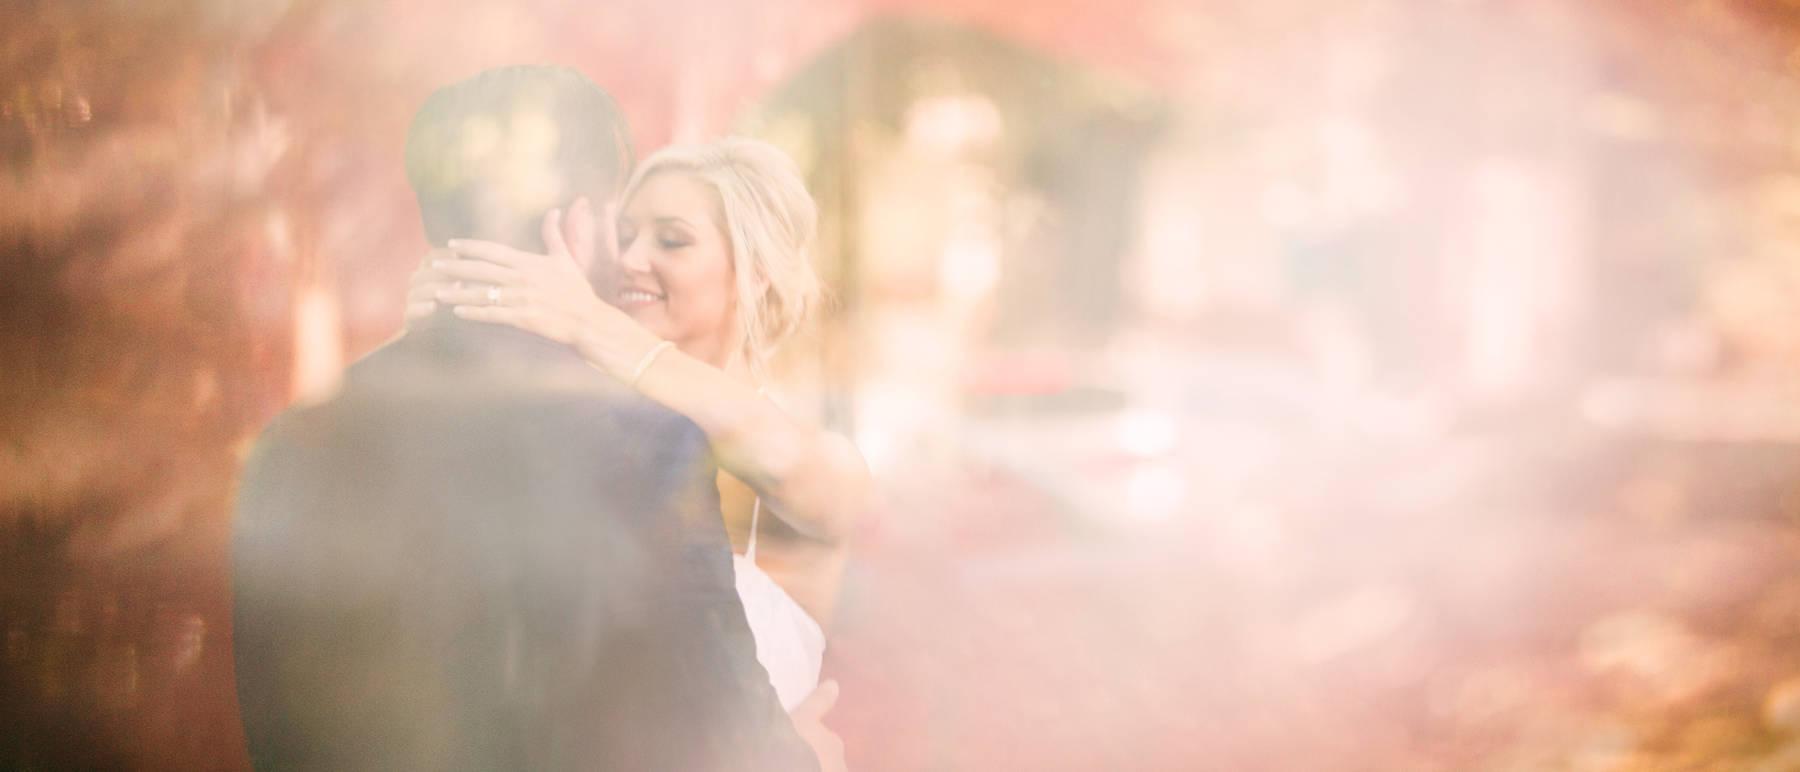 johnandjoseph-wedding-photographer-hz-slider-216